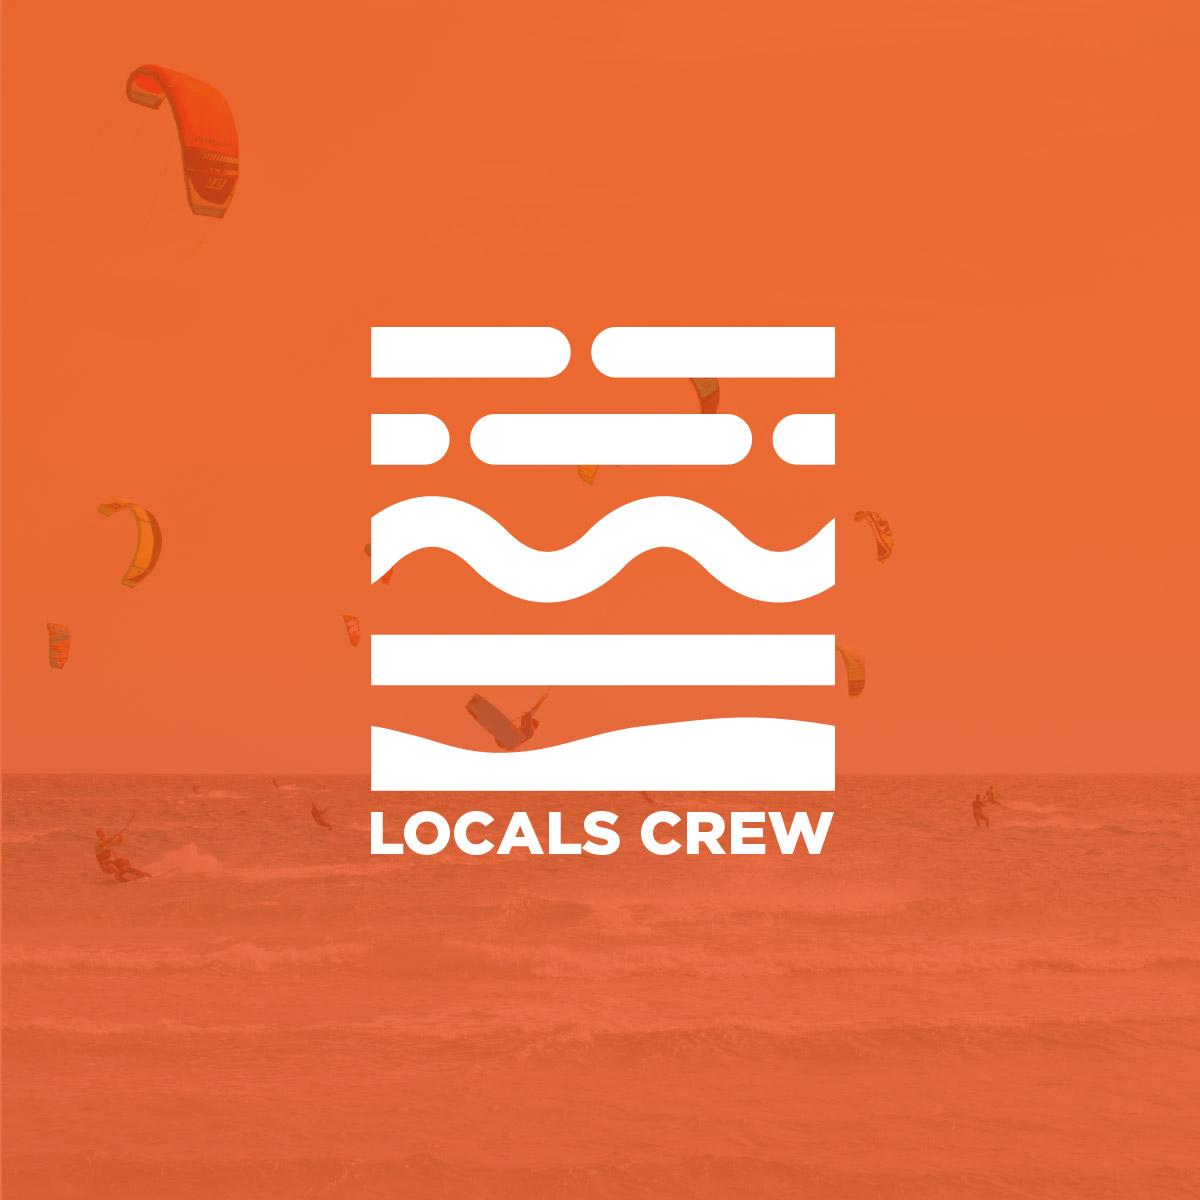 https://www.orlandinifrancesco.com/wp/wp-content/uploads/2019/02/Local-Crew-Salento-Logo-1.jpg